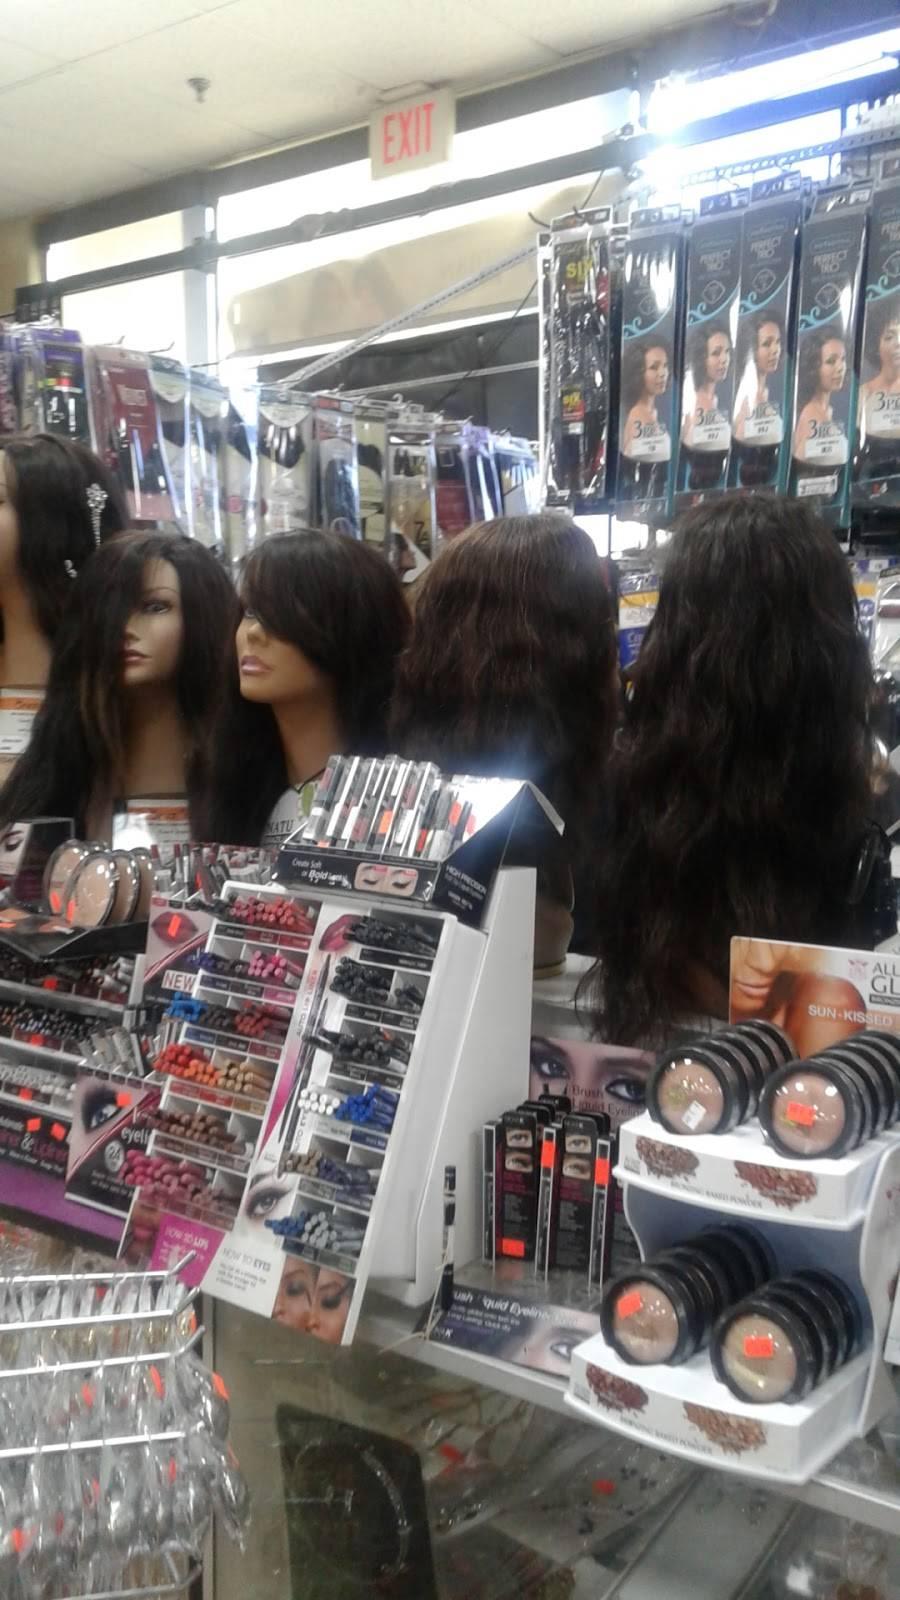 Kings Wigs & Beauty Supply 4 - hair care    Photo 10 of 10   Address: 661 San Juan Rd, Sacramento, CA 95834, USA   Phone: (916) 922-5050